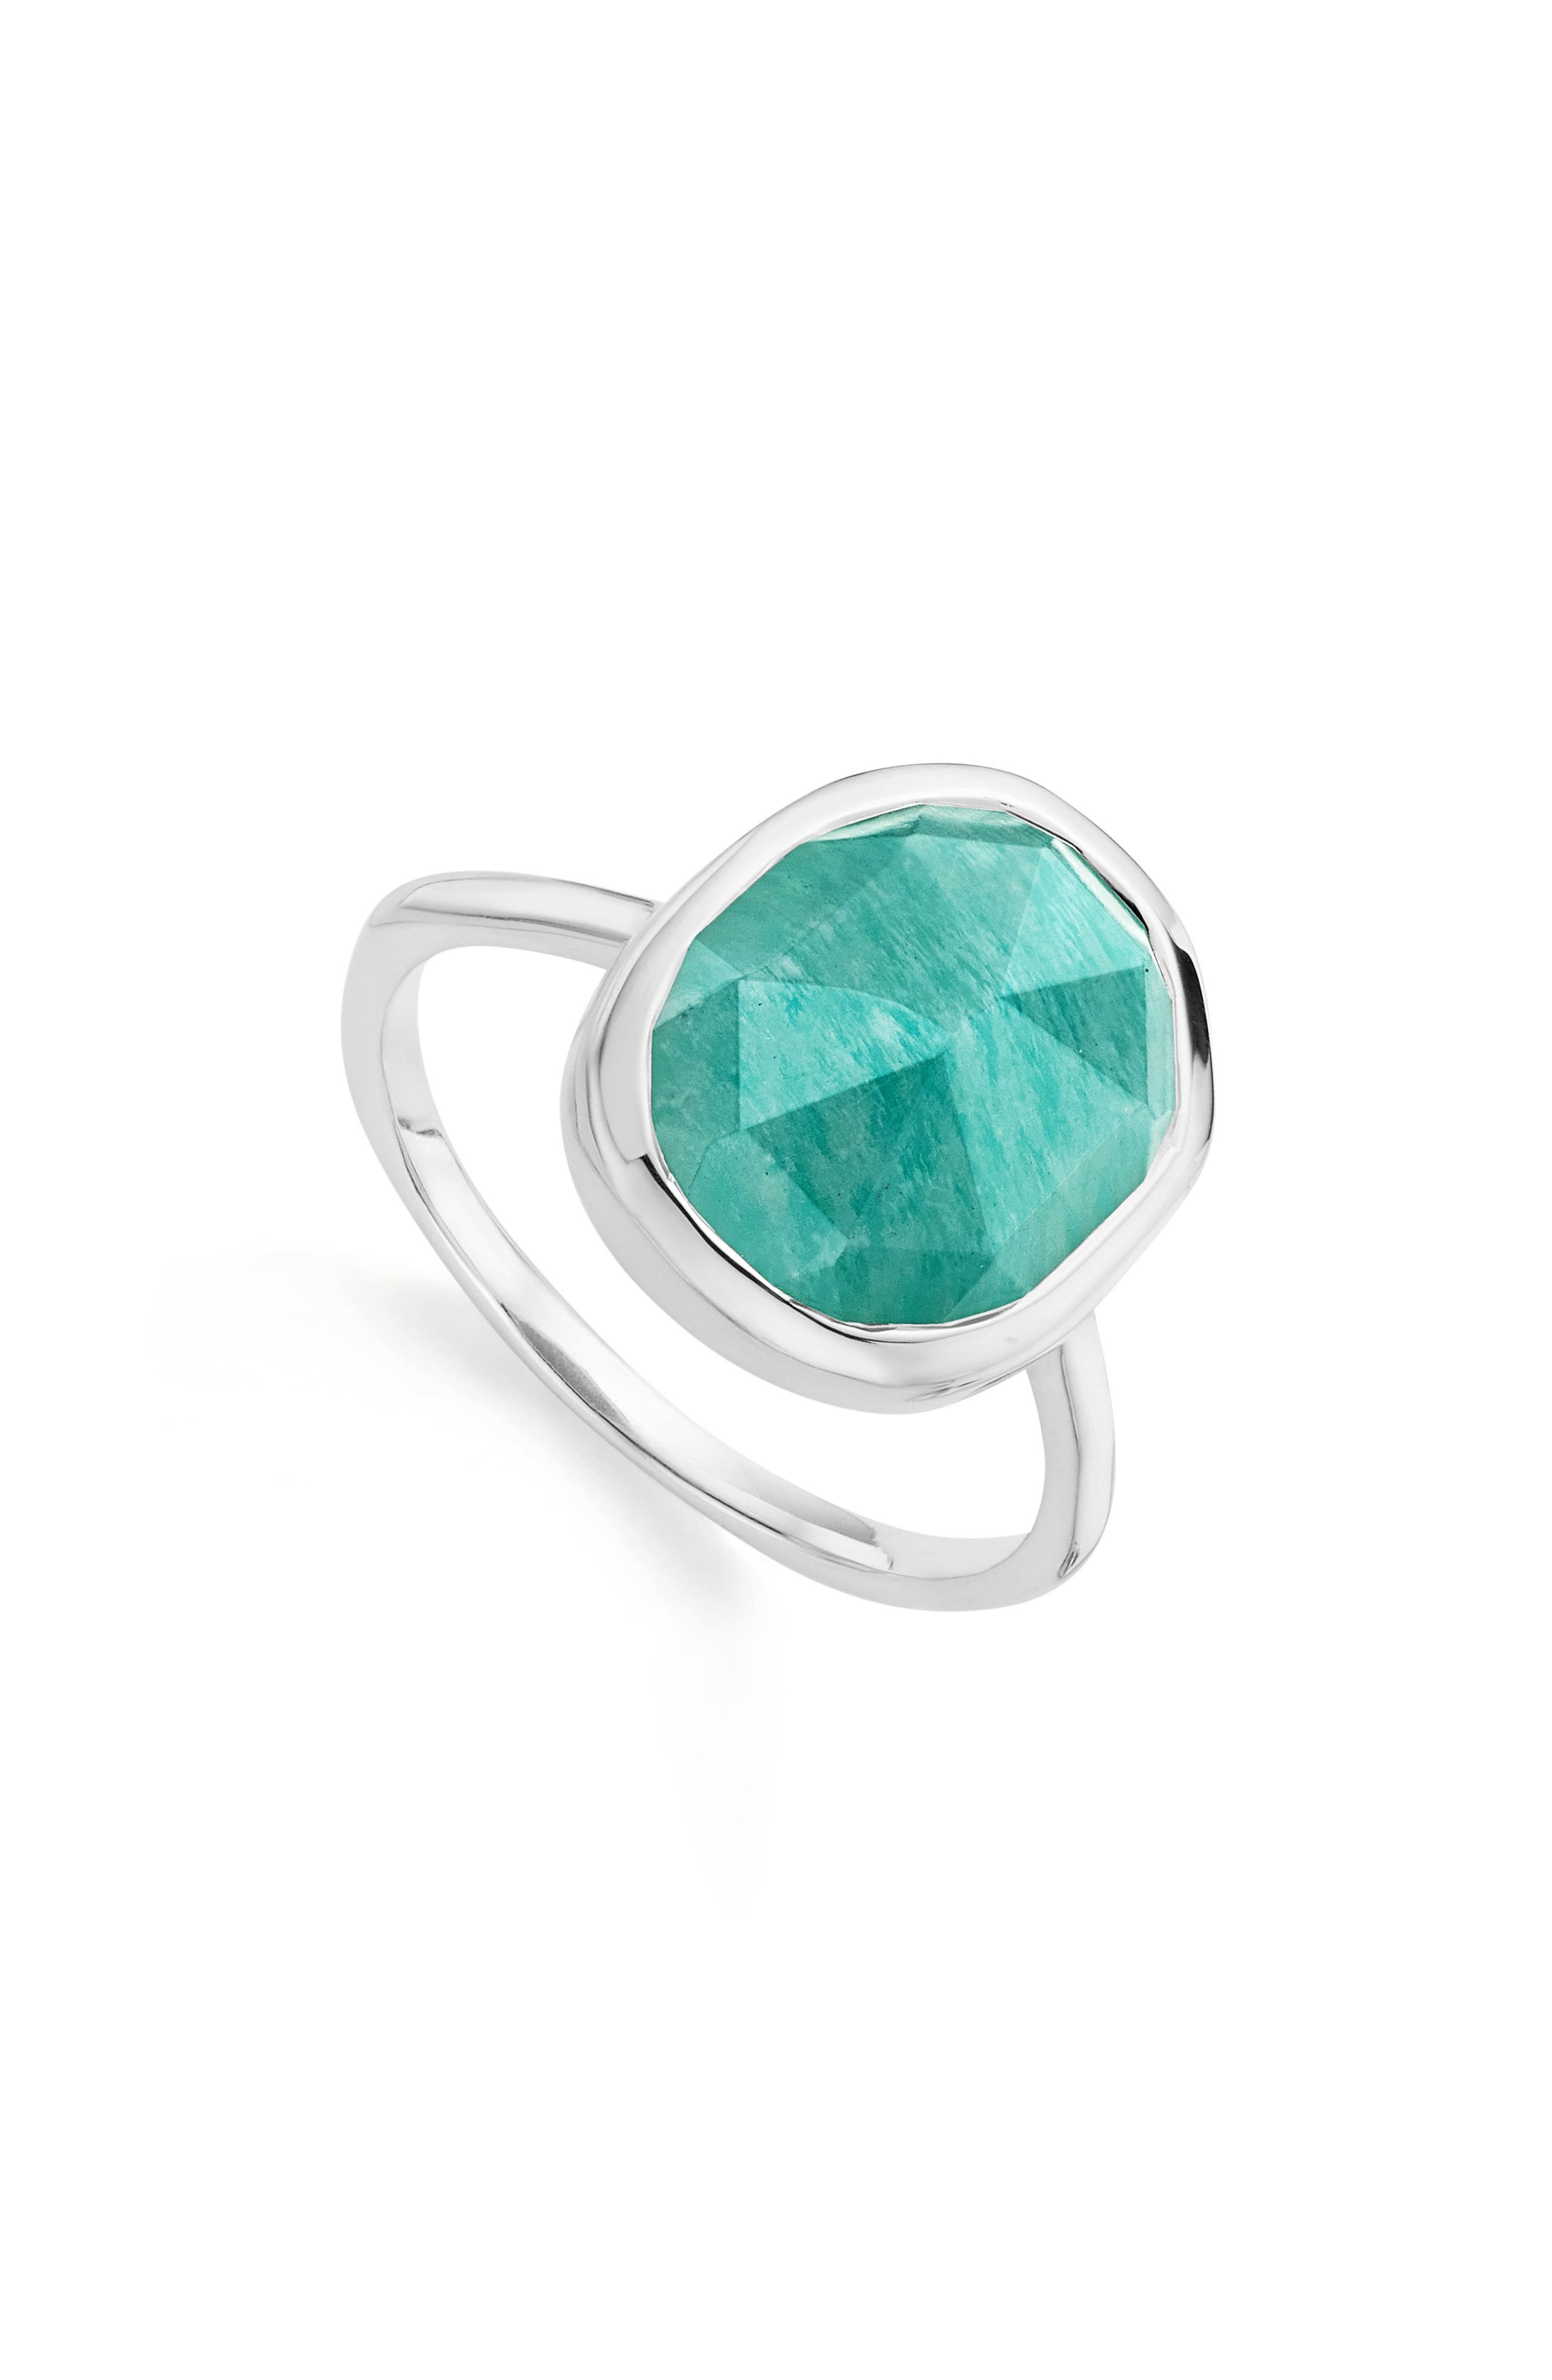 Main Image - Monica Vinader 'Siren' Medium Semiprecious Stone Stacking Ring